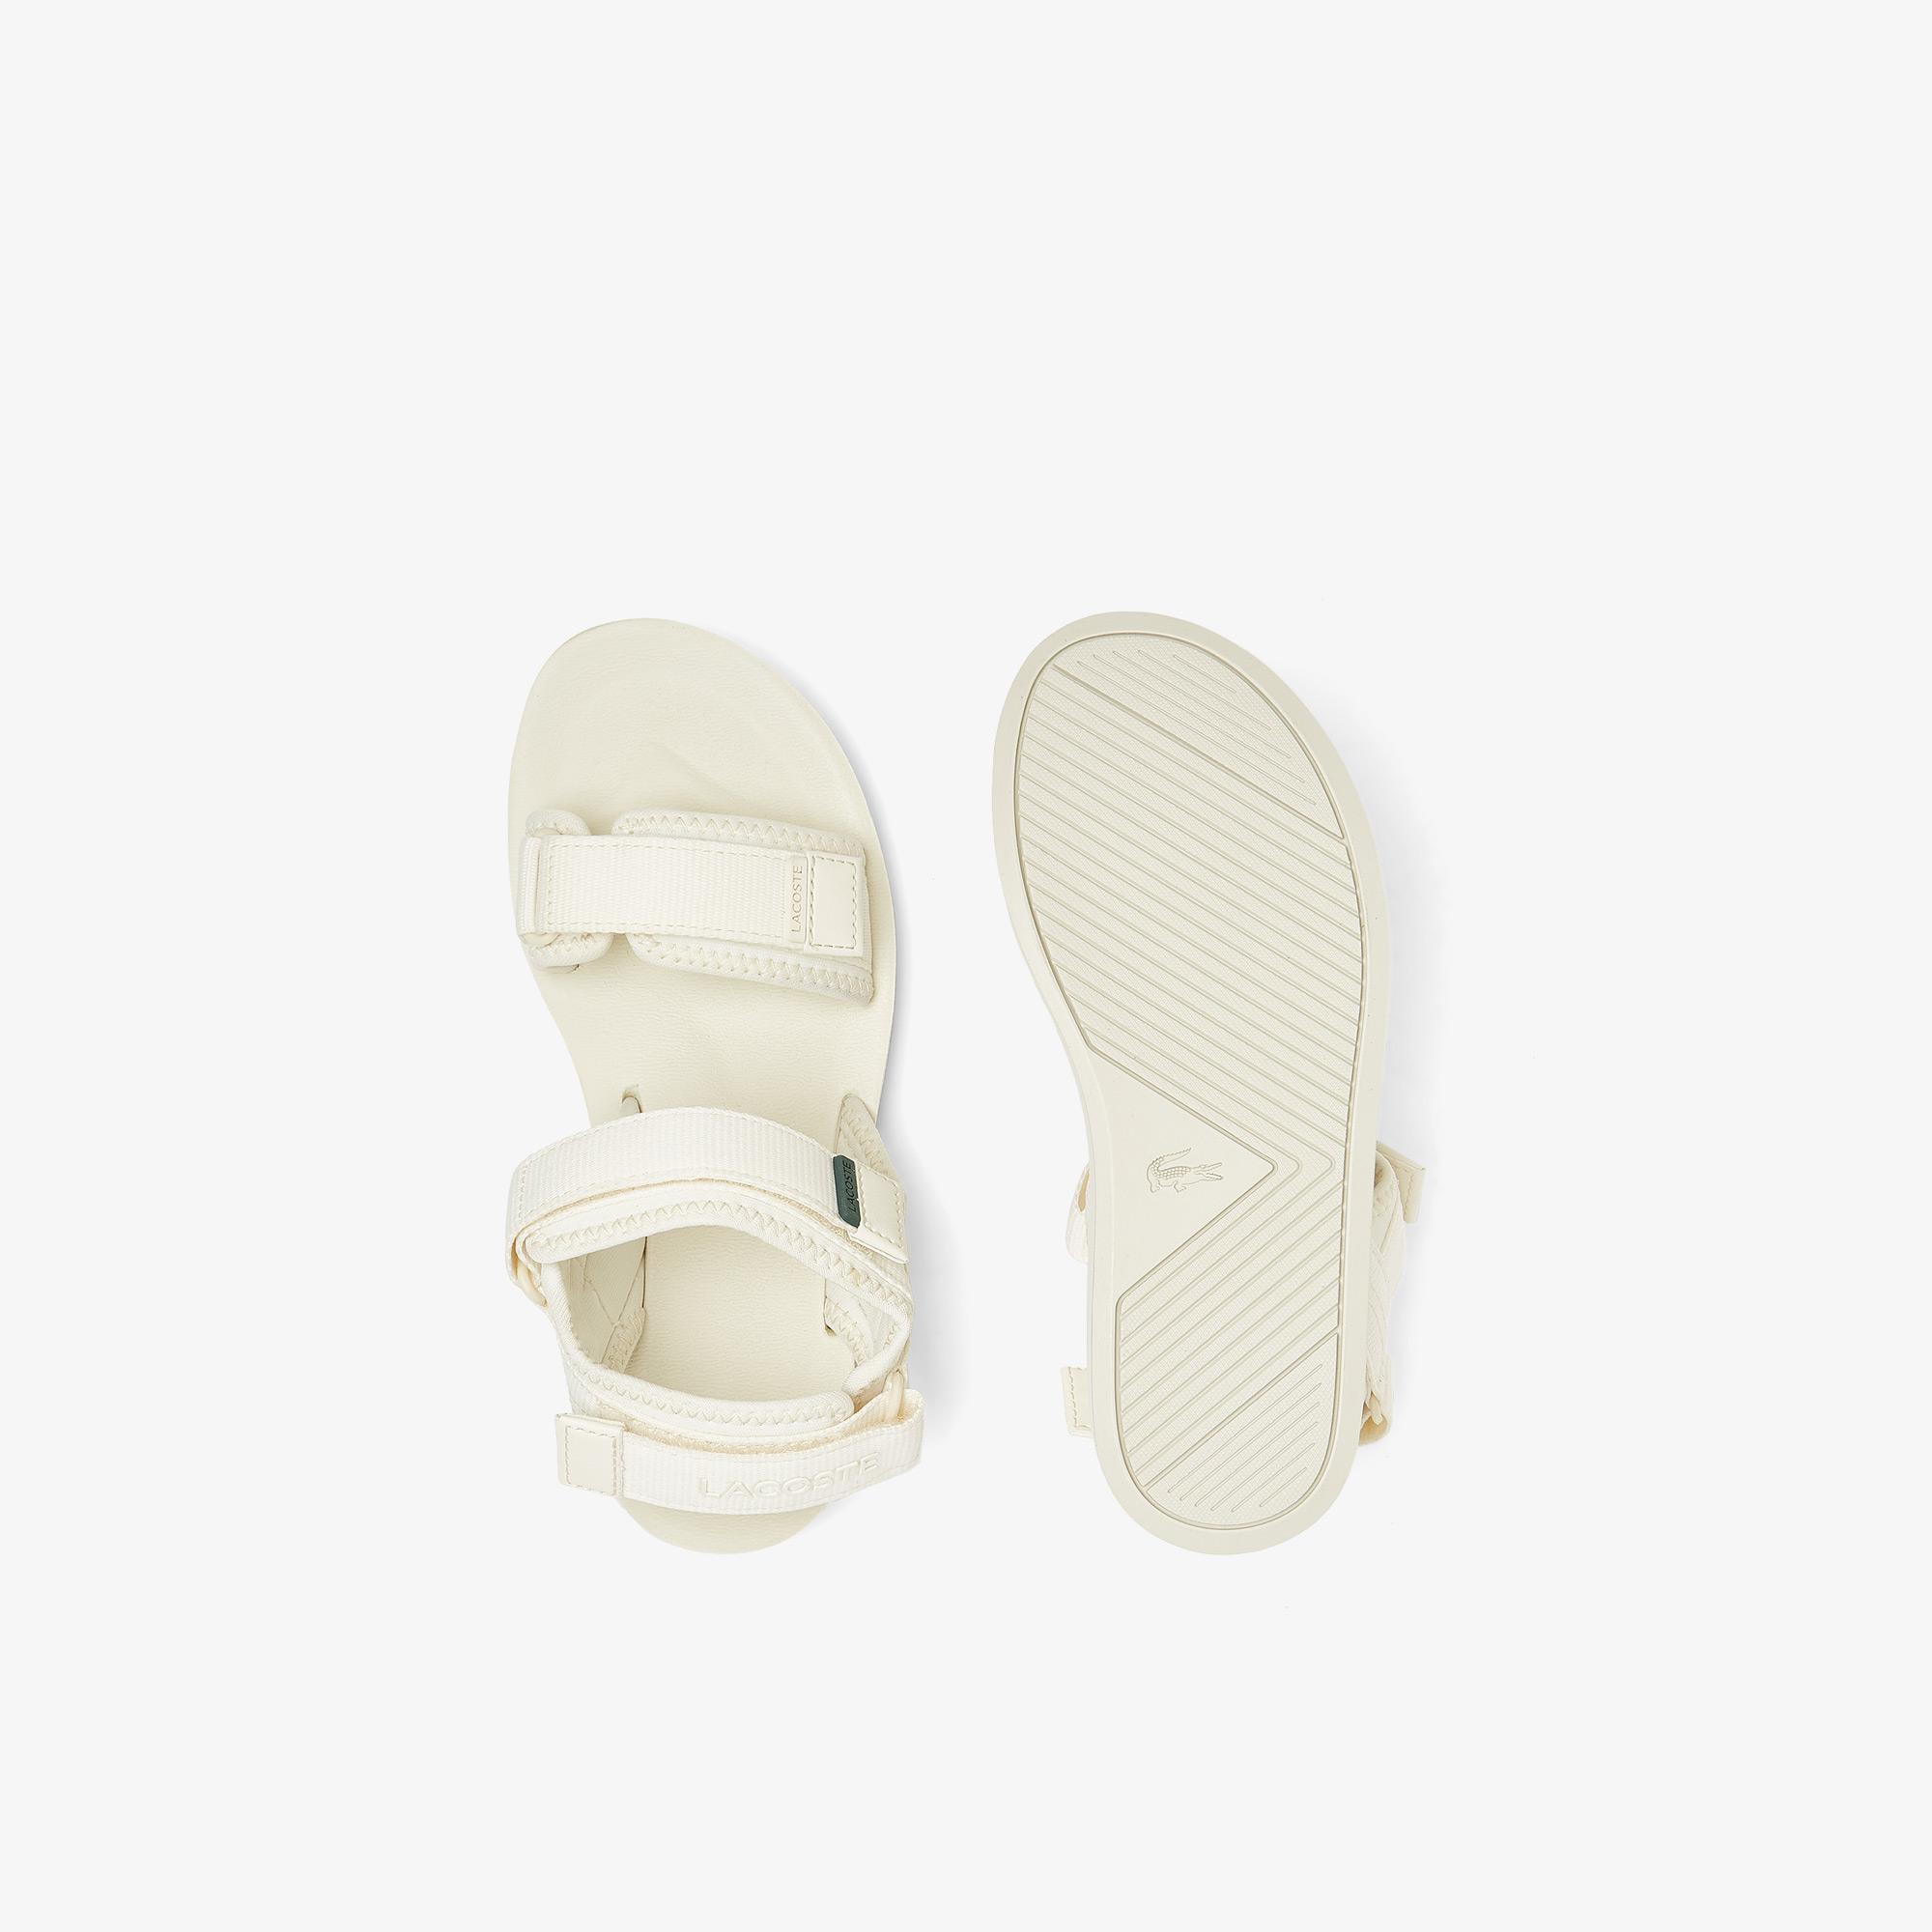 Lacoste Women's Suruga 0921 1 Cfa Shoes